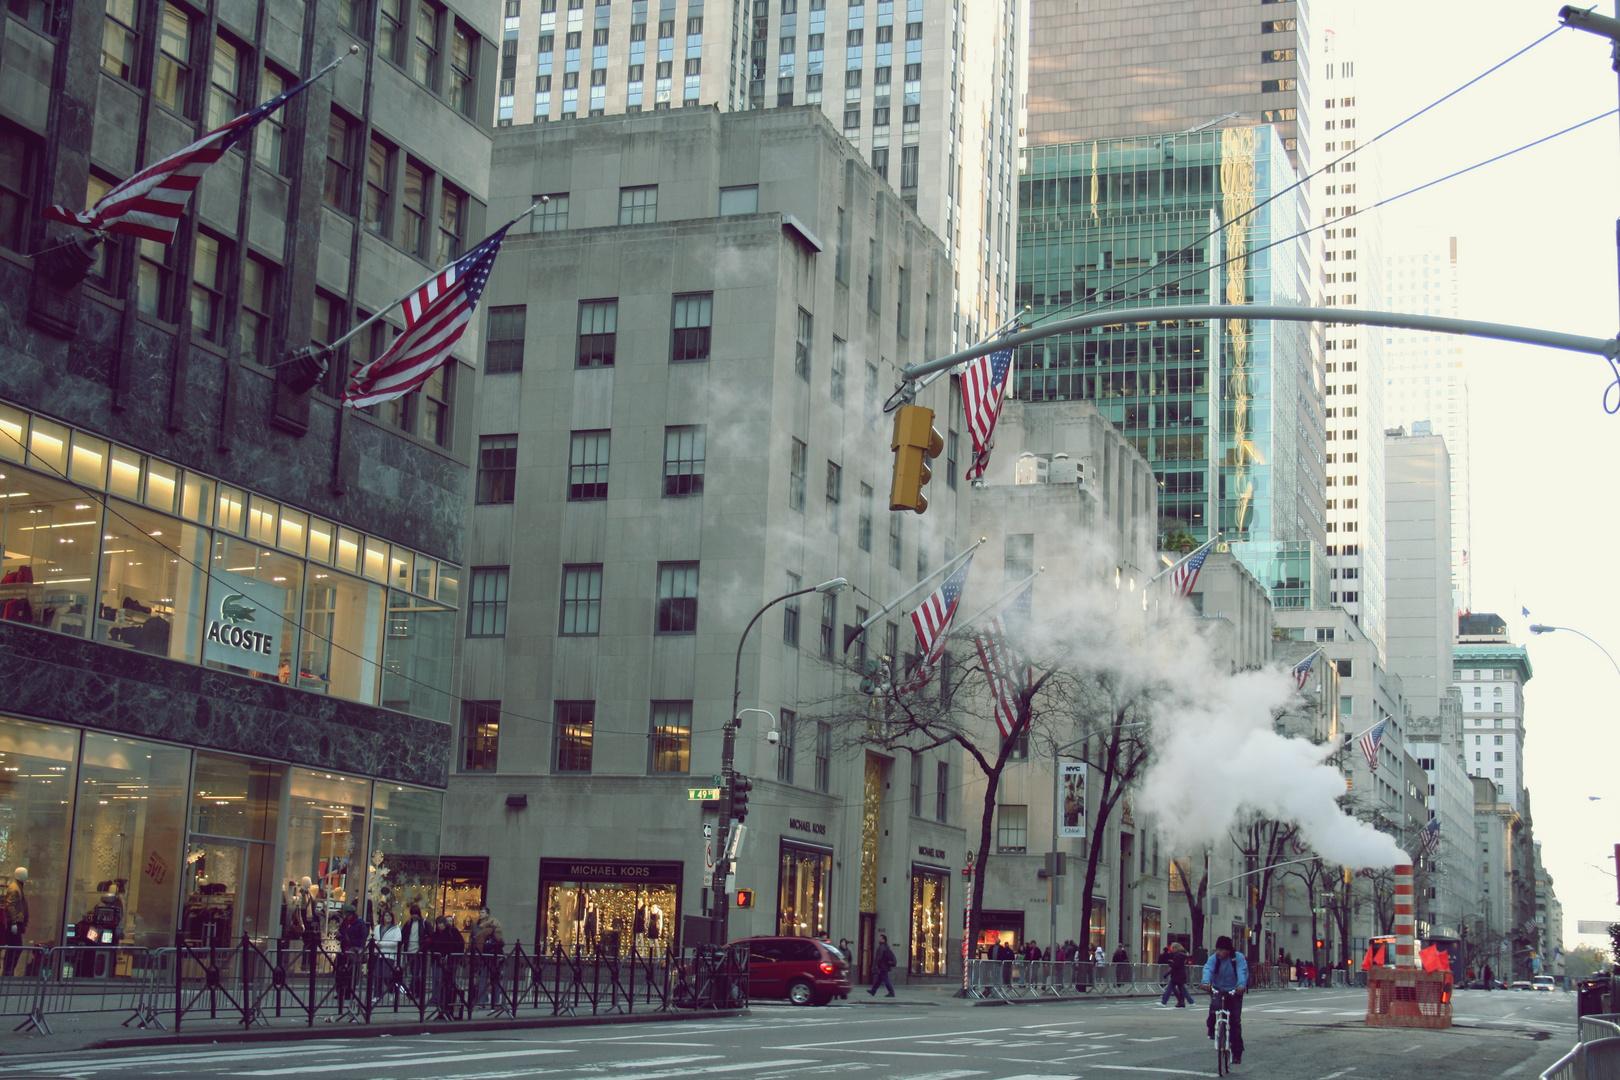 8 Uhr morgens, New York City